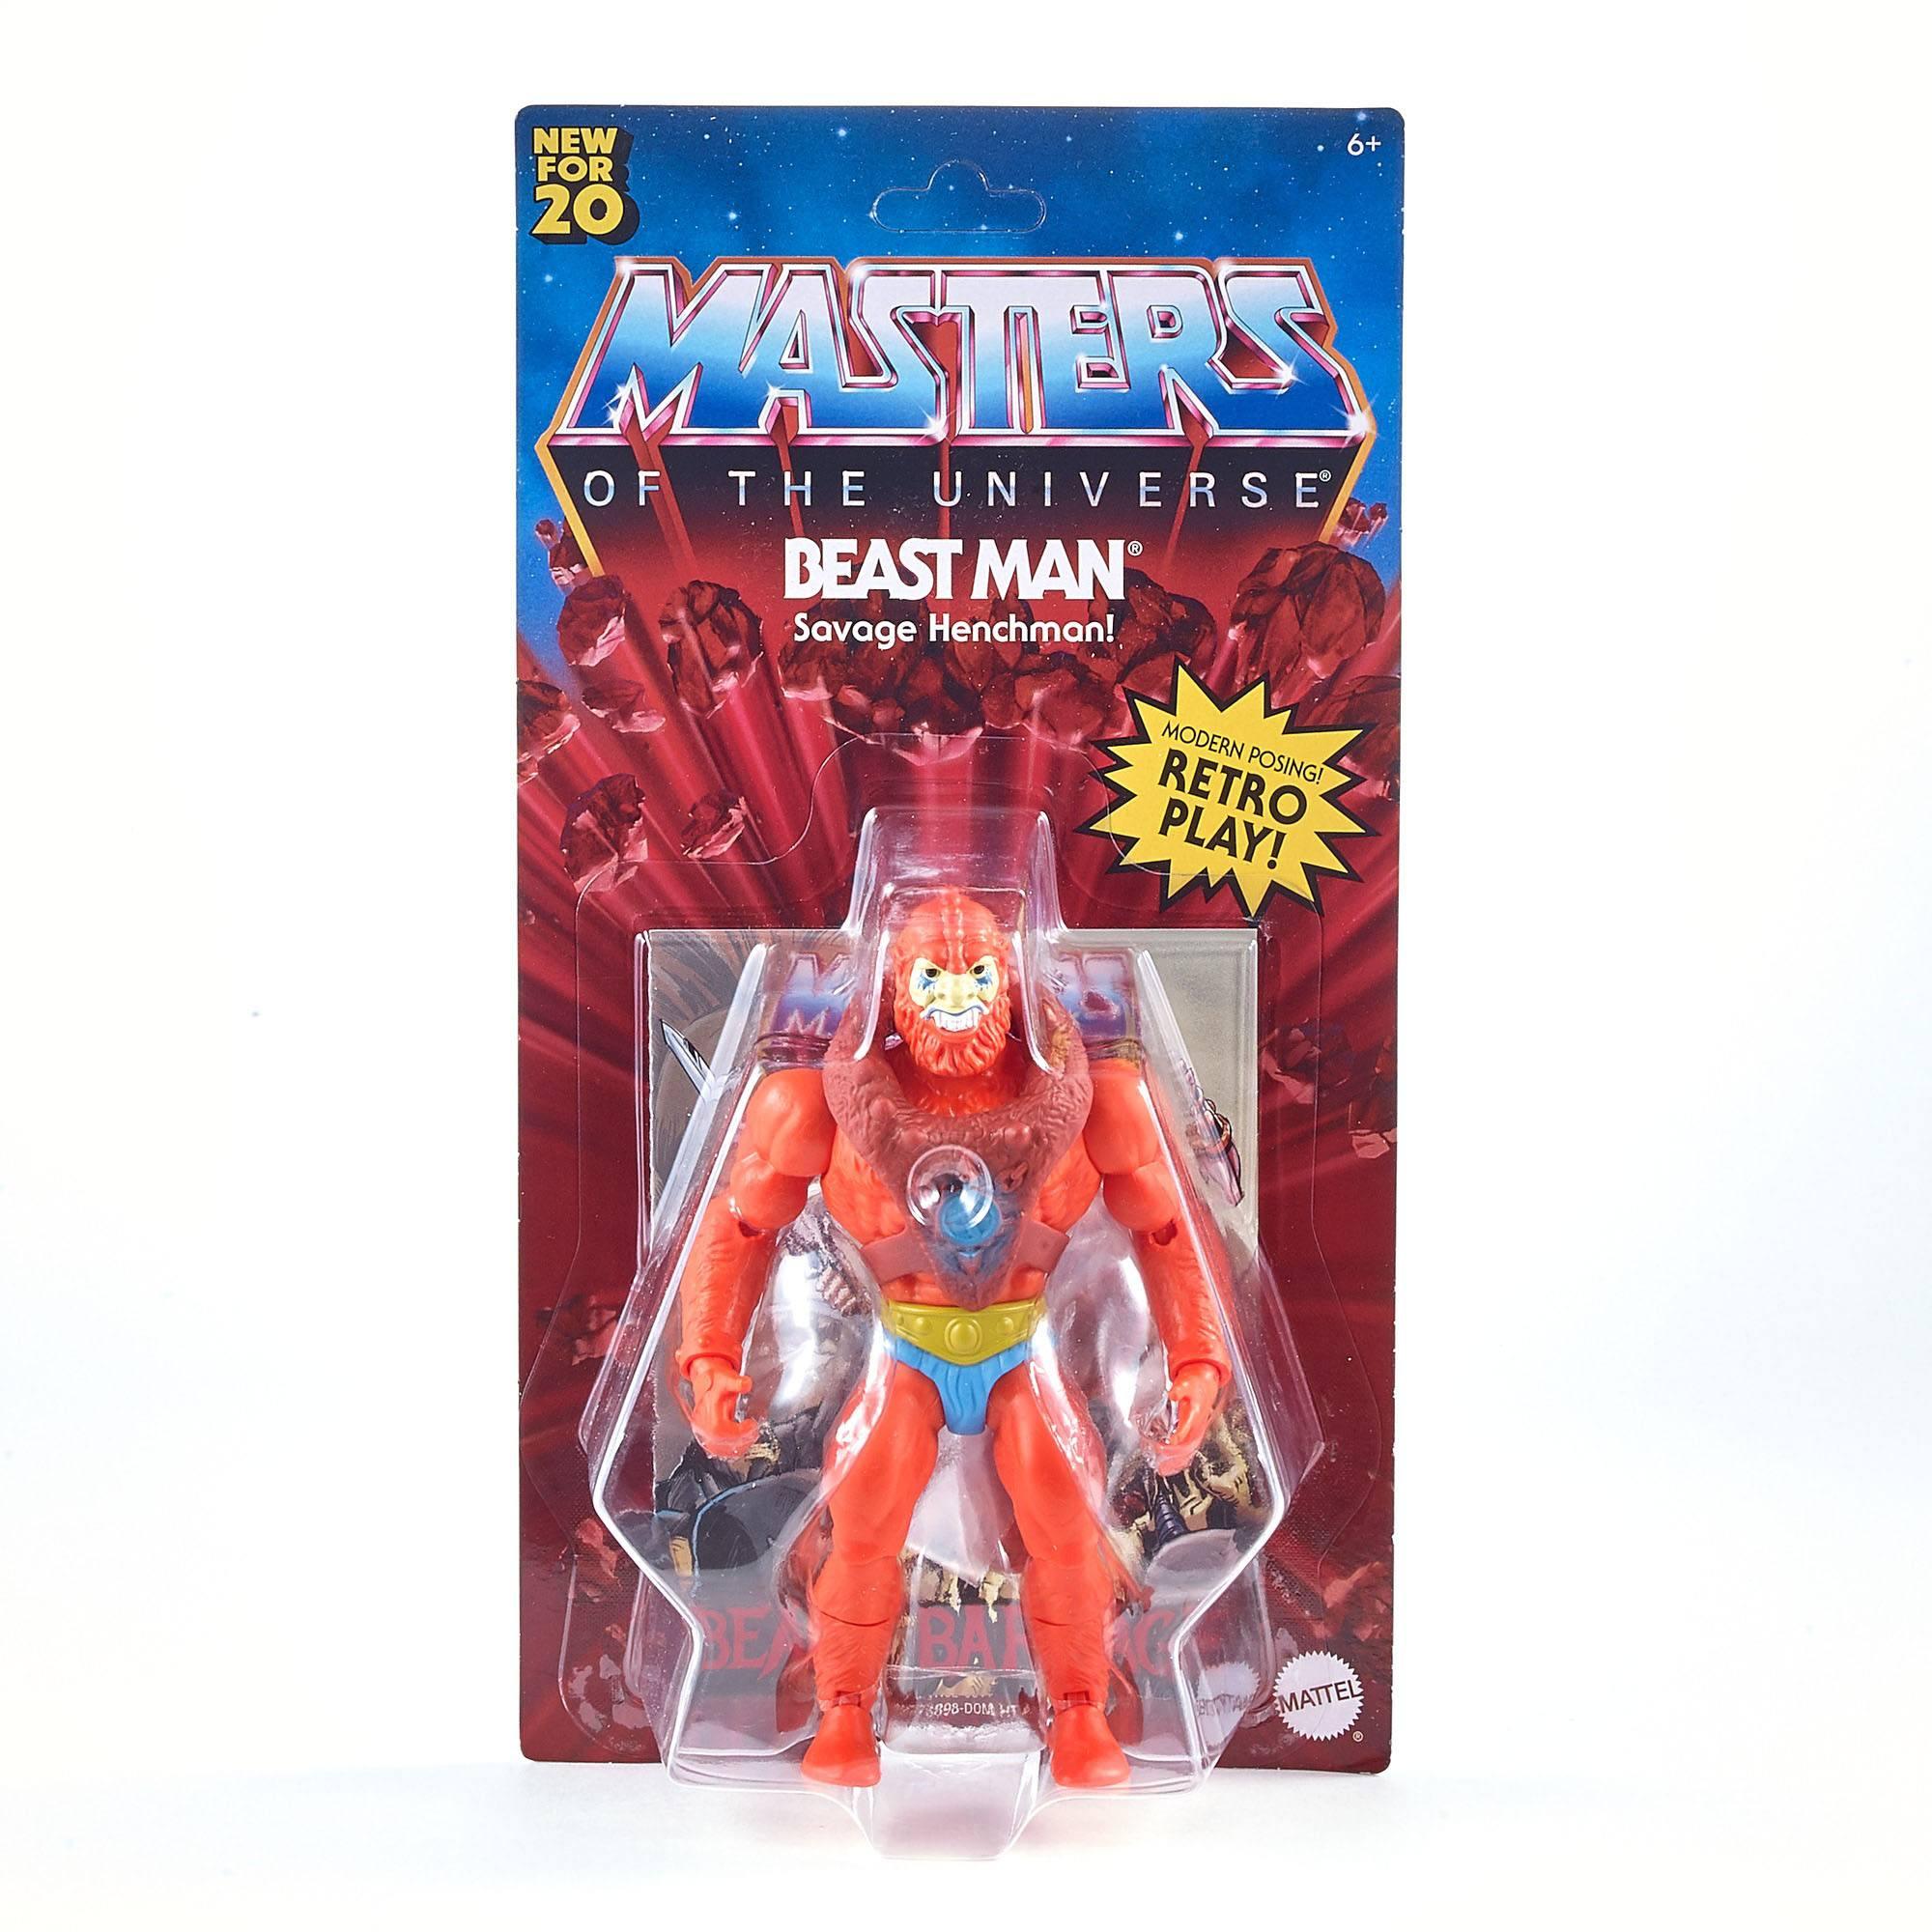 Masters of the Universe Origins Actionfigur 2020 Beast Man 14 cm MATTGNN92 0887961875355